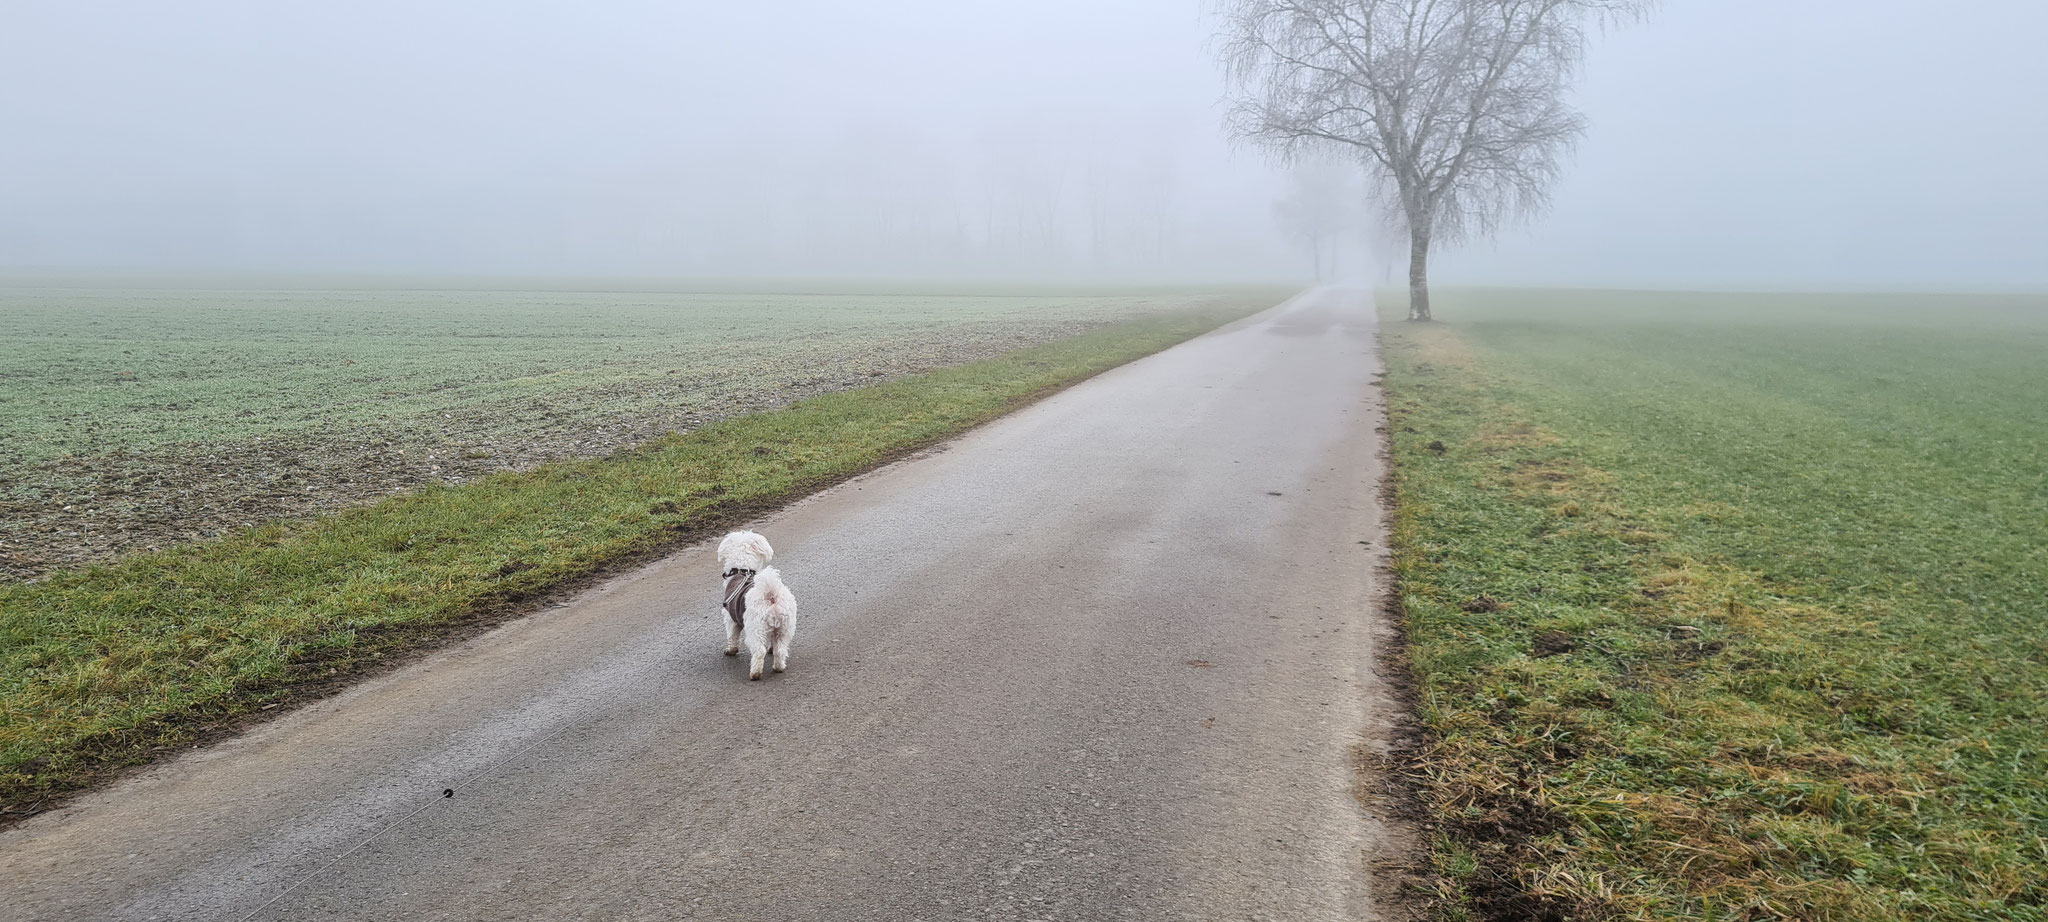 Langer Spaziergang am Nachmittag - im Nebel